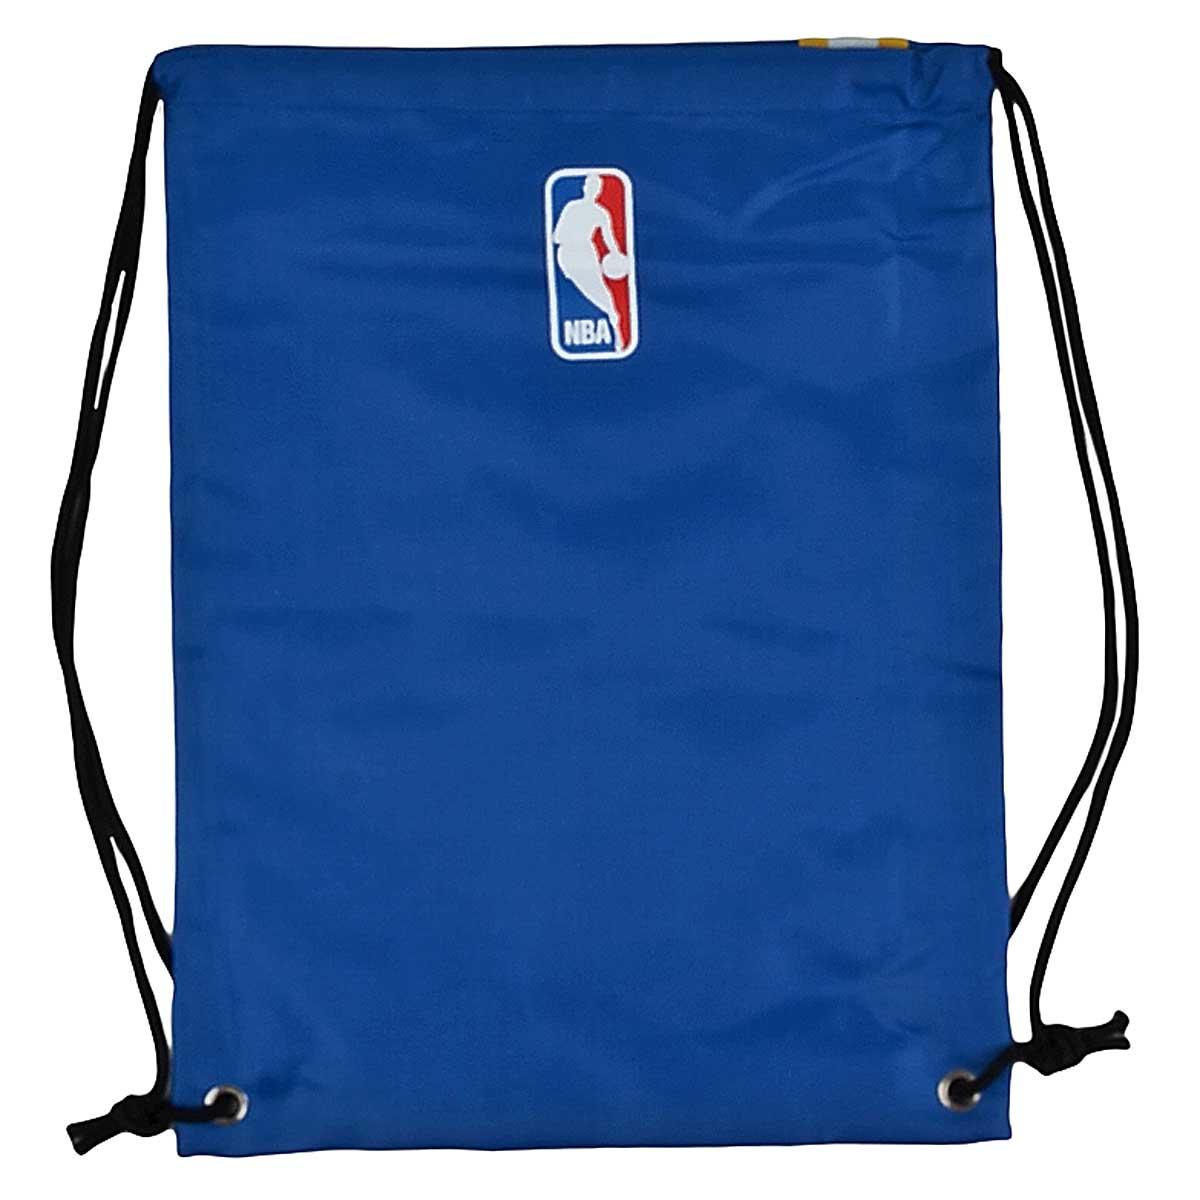 Gym Bag Jim Kidd: Warriors NBA Gym Drawstring Bag